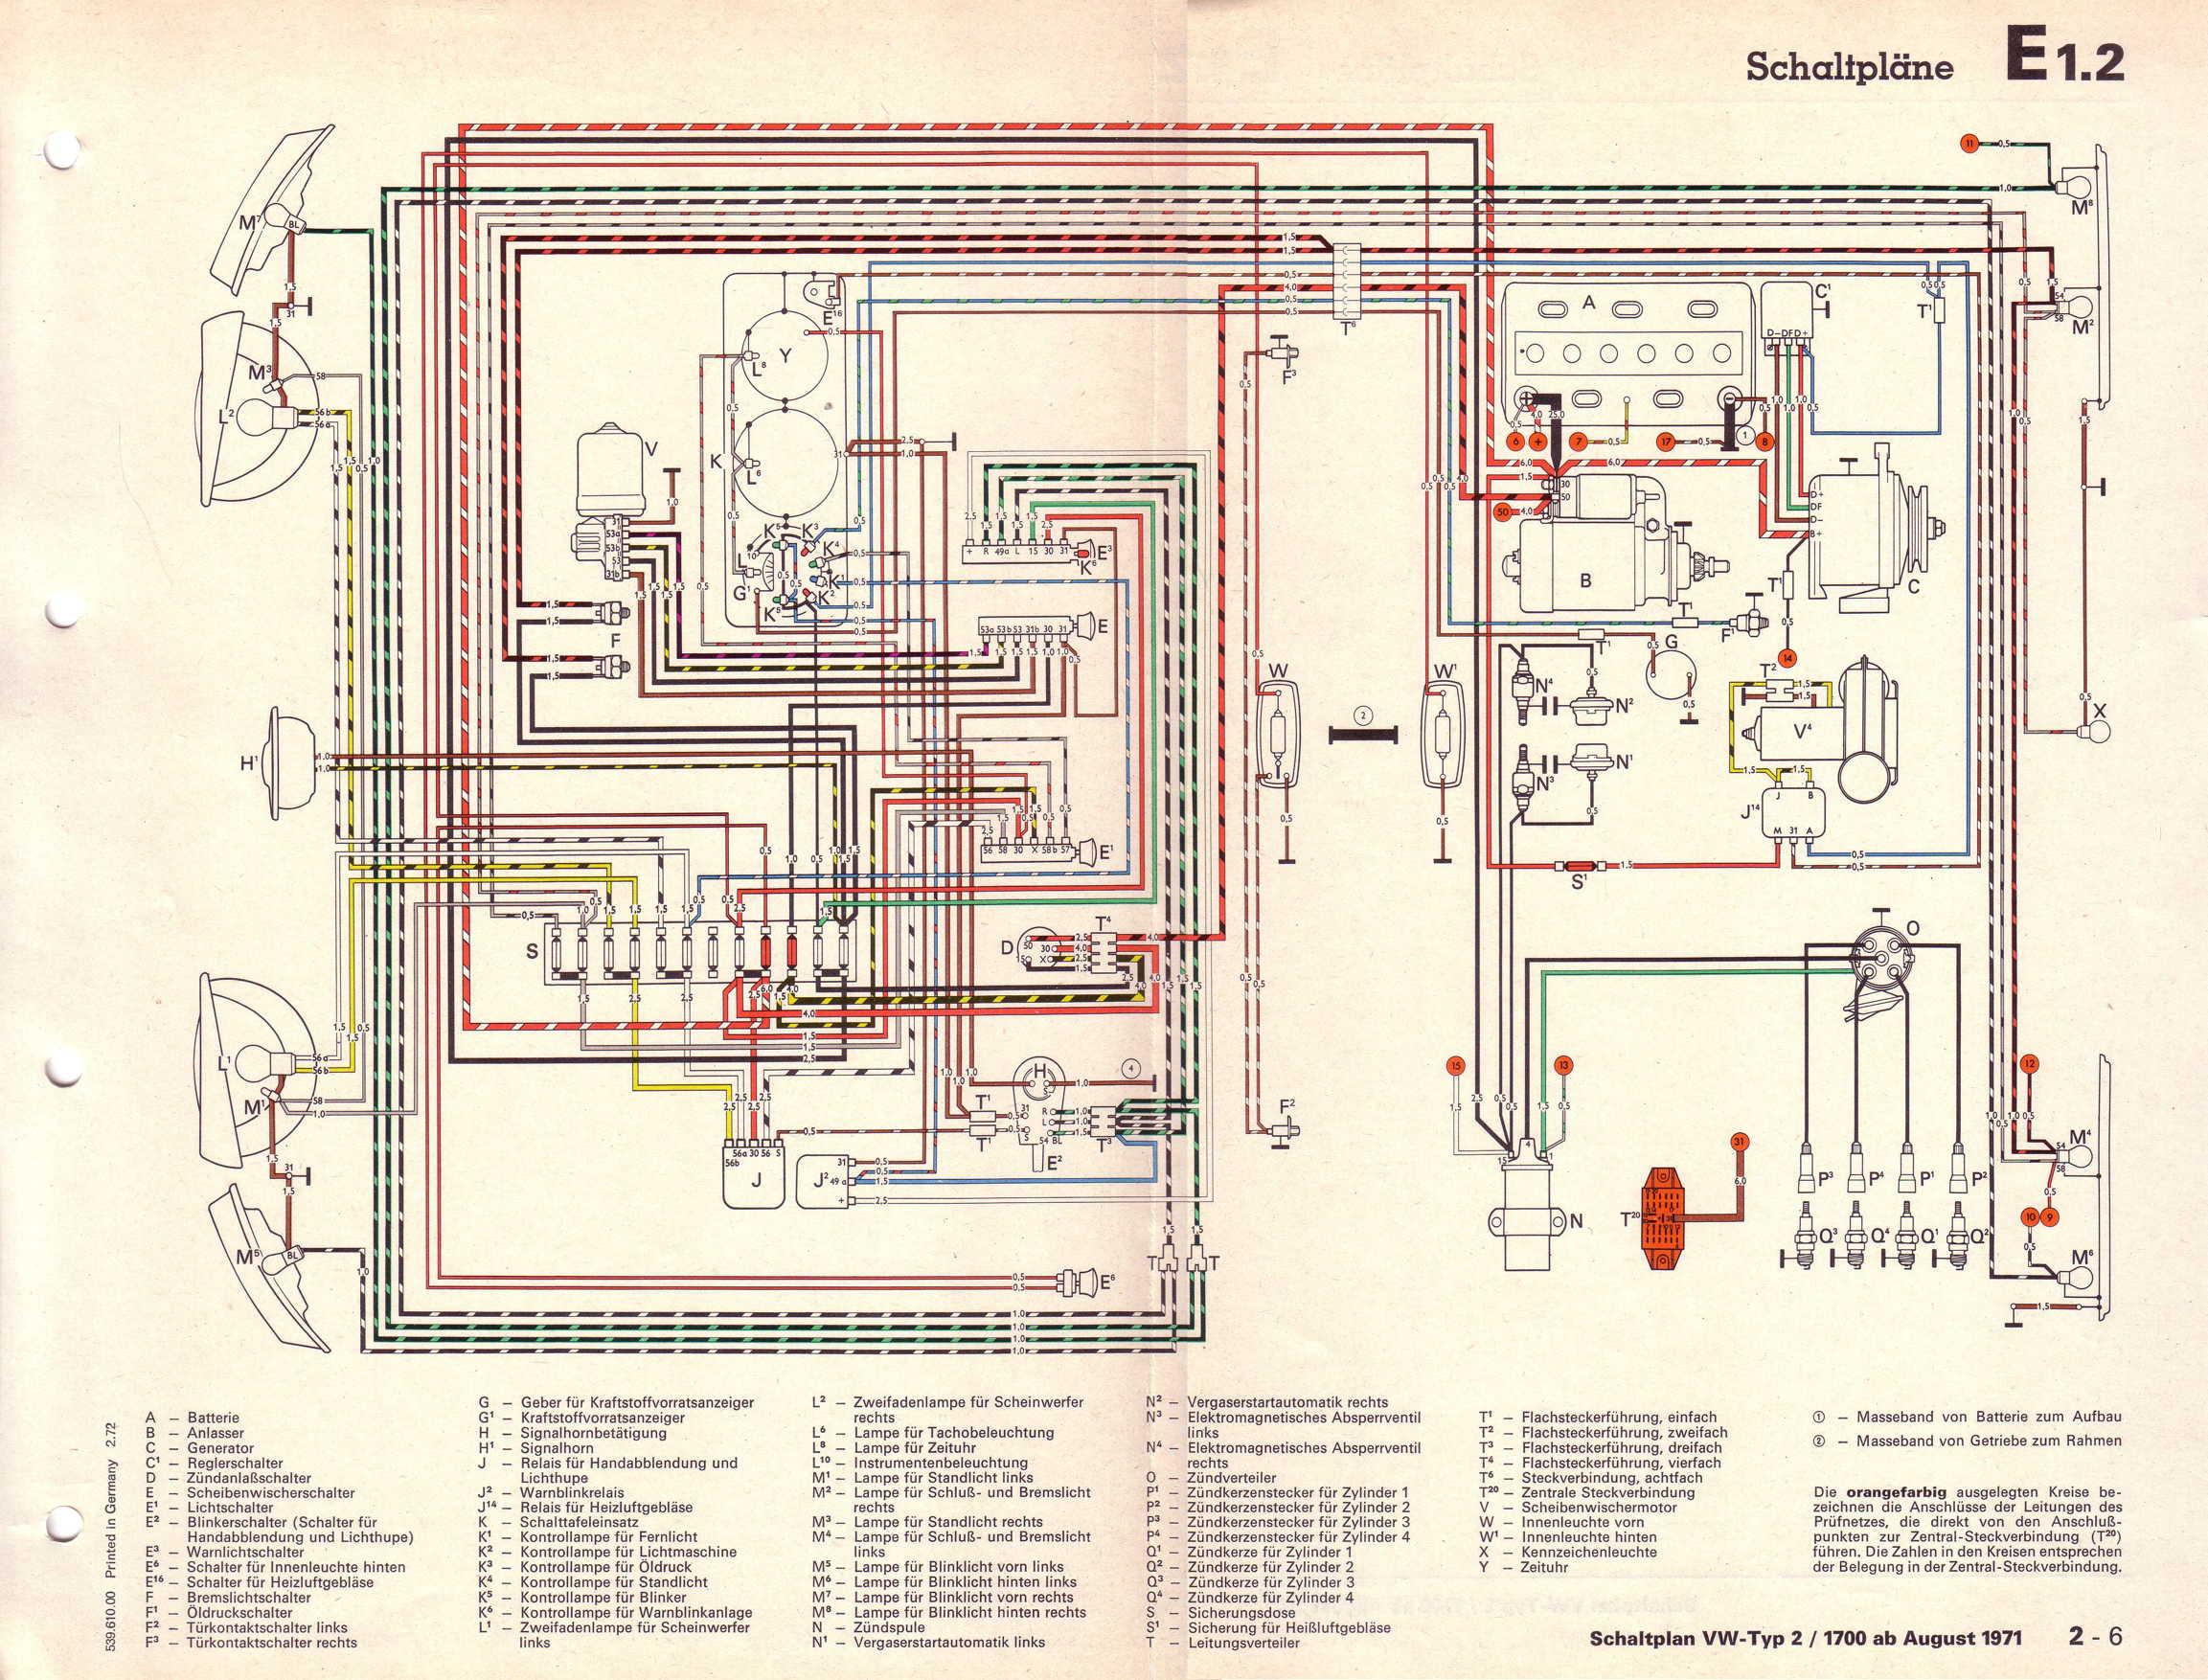 1971 Vw Transporter Wiring Diagram Block Explanation 1969 Baduras Volkswagen T2 Bulli Seite Autos Post Beetle